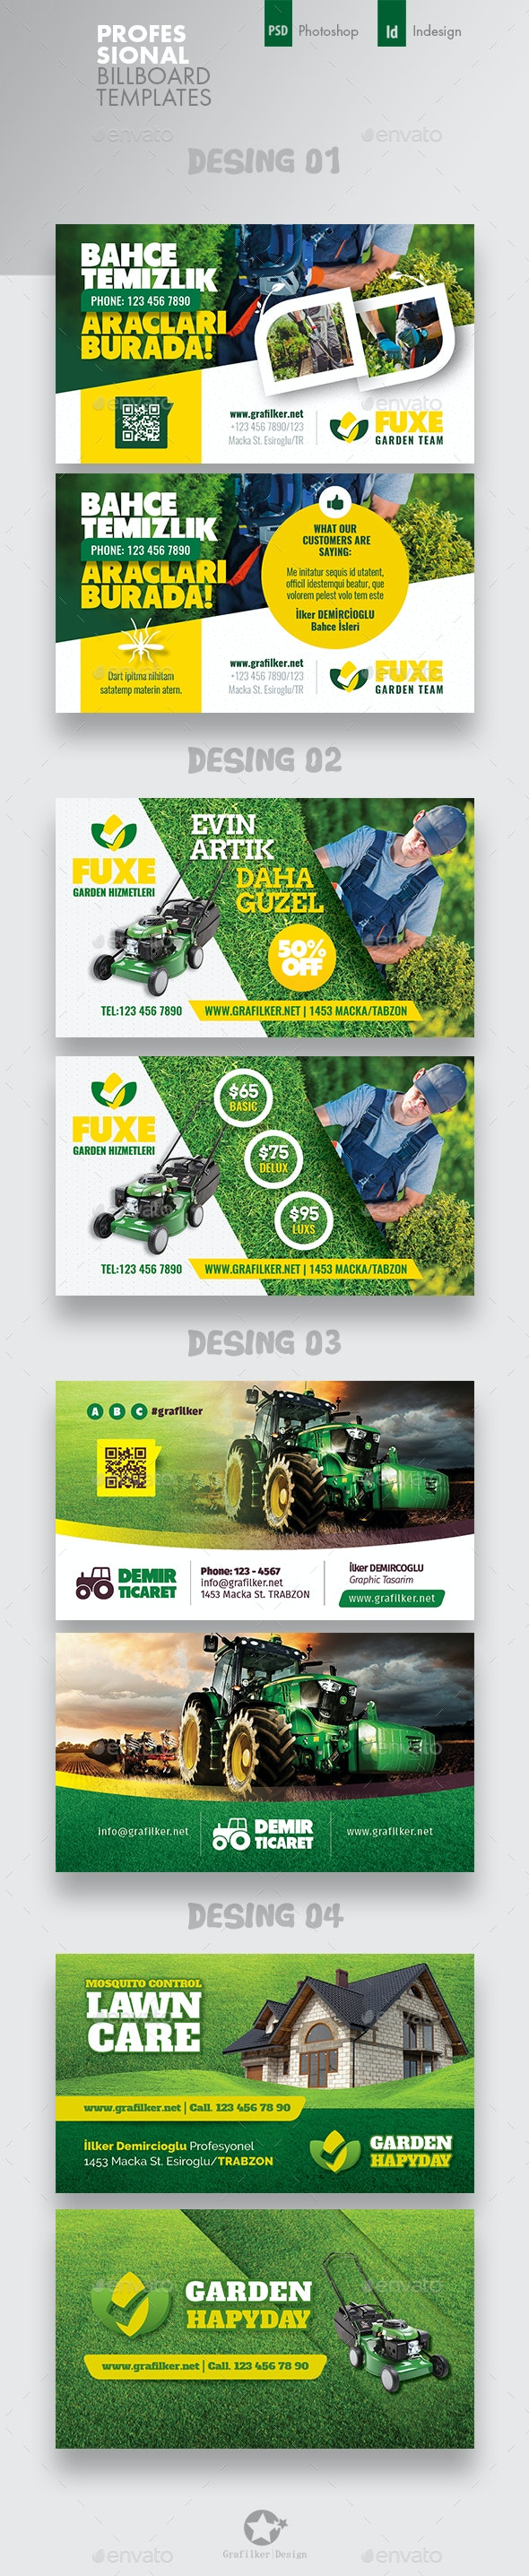 Garden Landspace Business Card Bundle Templates - Corporate Business Cards